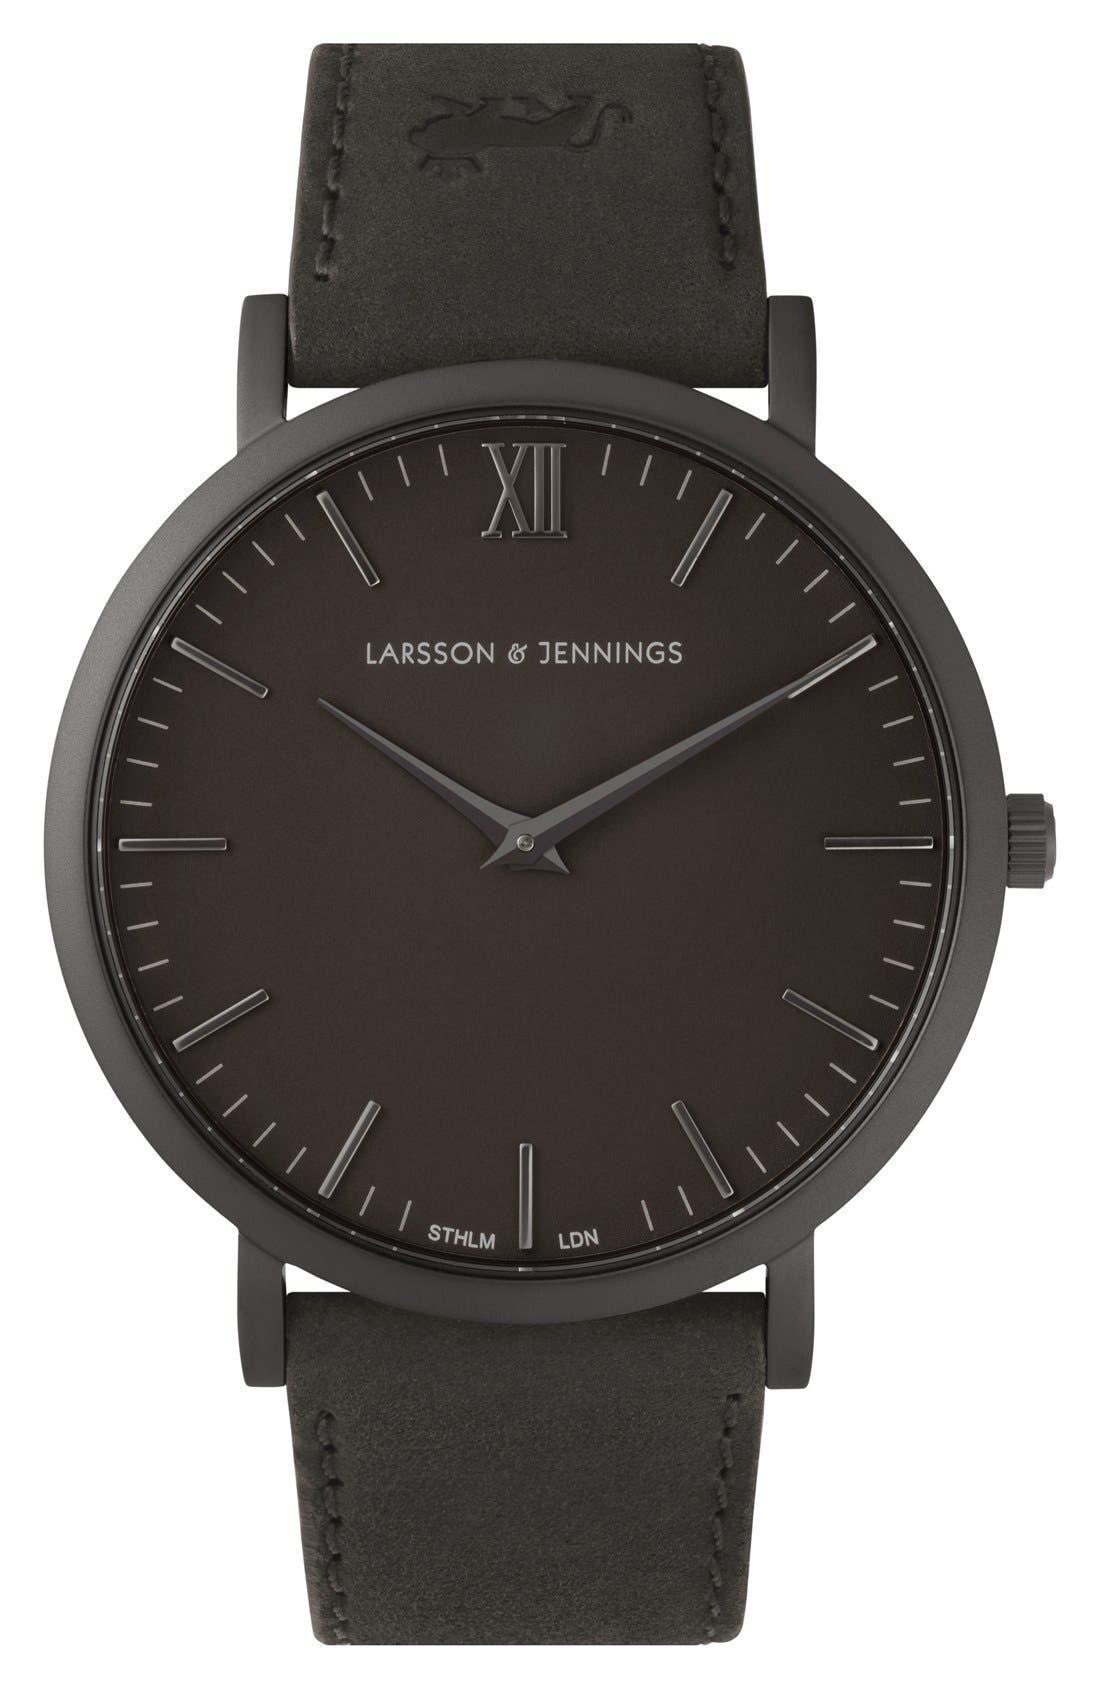 Alternate Image 1 Selected - Larsson & Jennings 'Lugano' Leather Strap Watch, 40mm